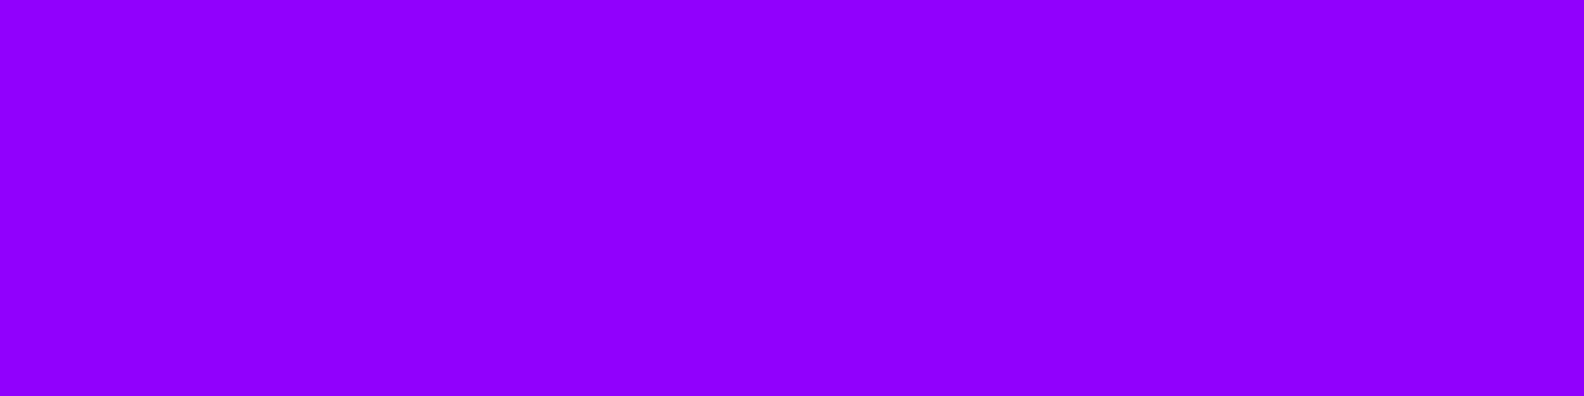 1584x396 Electric Violet Solid Color Background